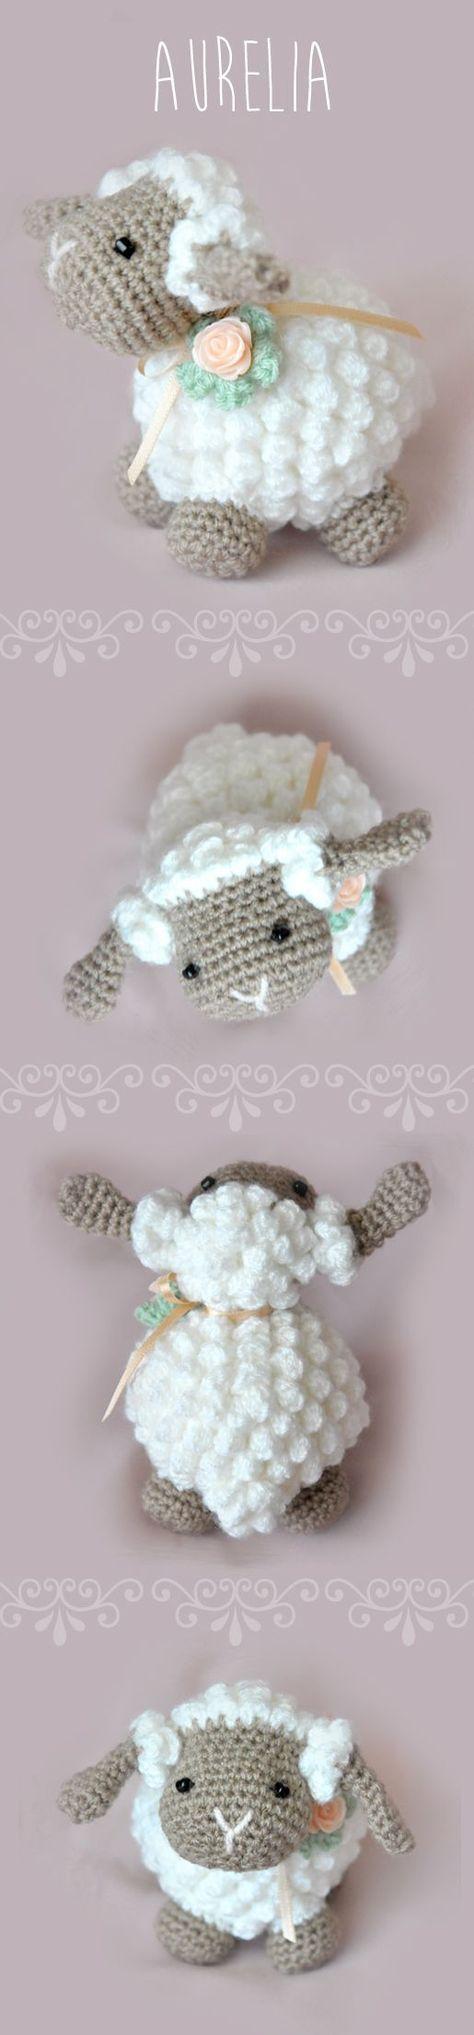 Amigurumi Lamb - FREE Crochet Pattern / Tutorial   Patron ...